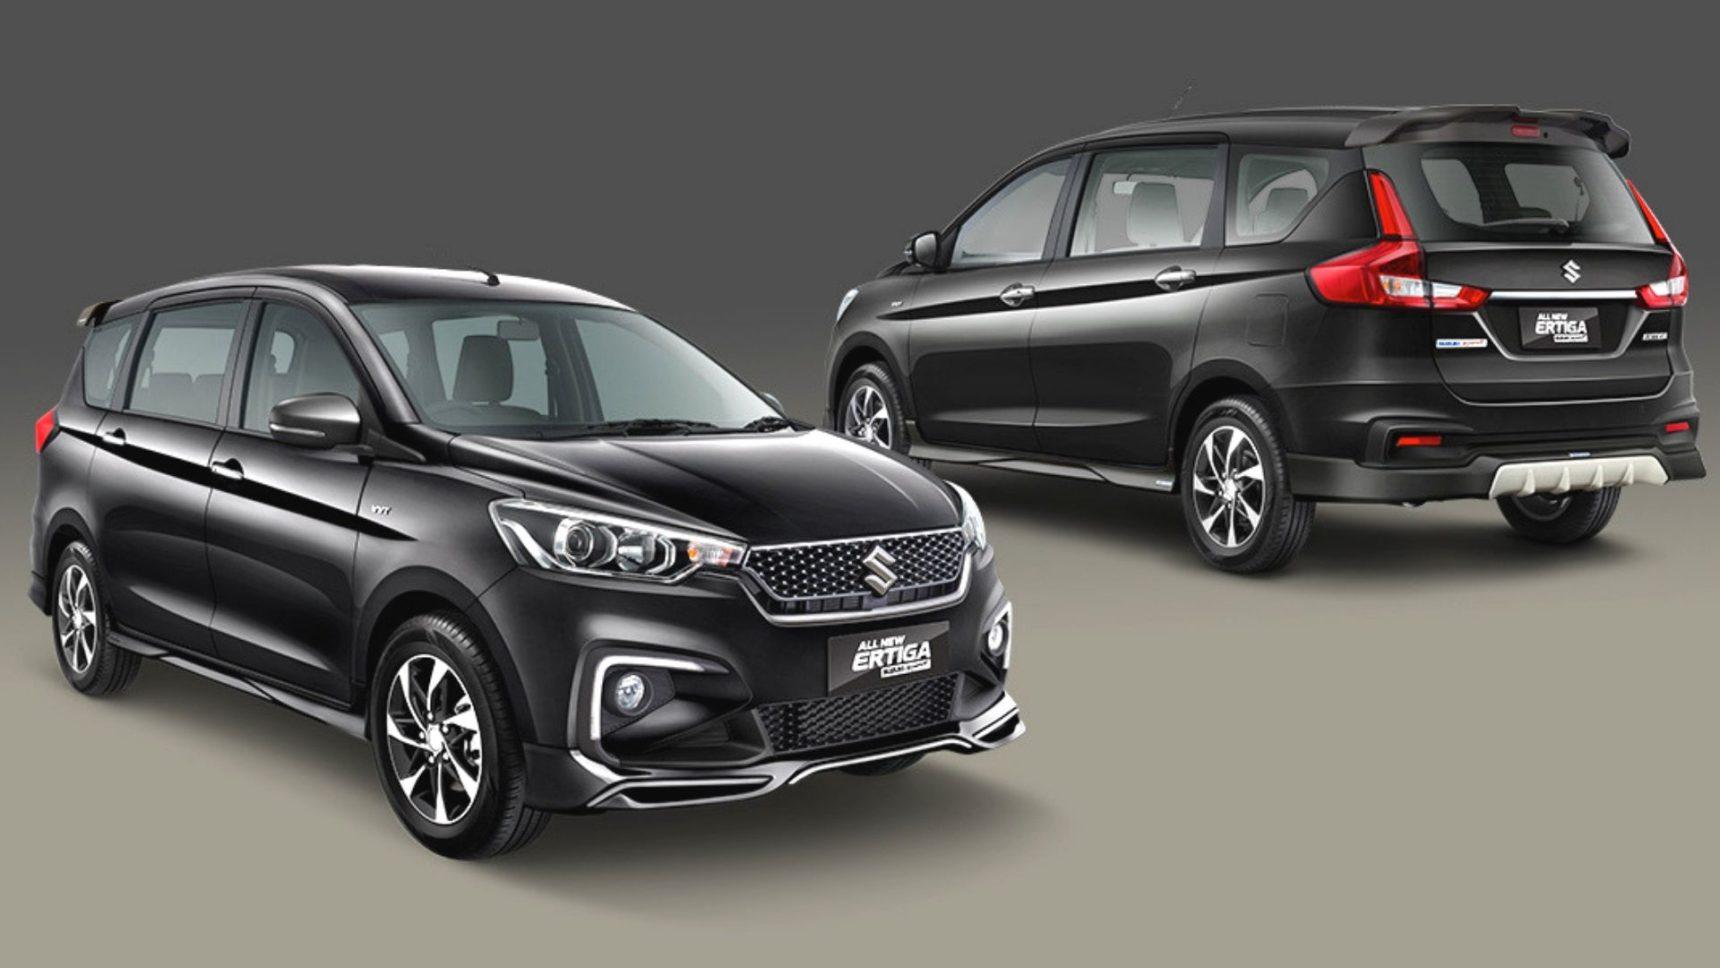 6 Seater Maruti Suzuki Ertiga Cross Likely To Launch Soon